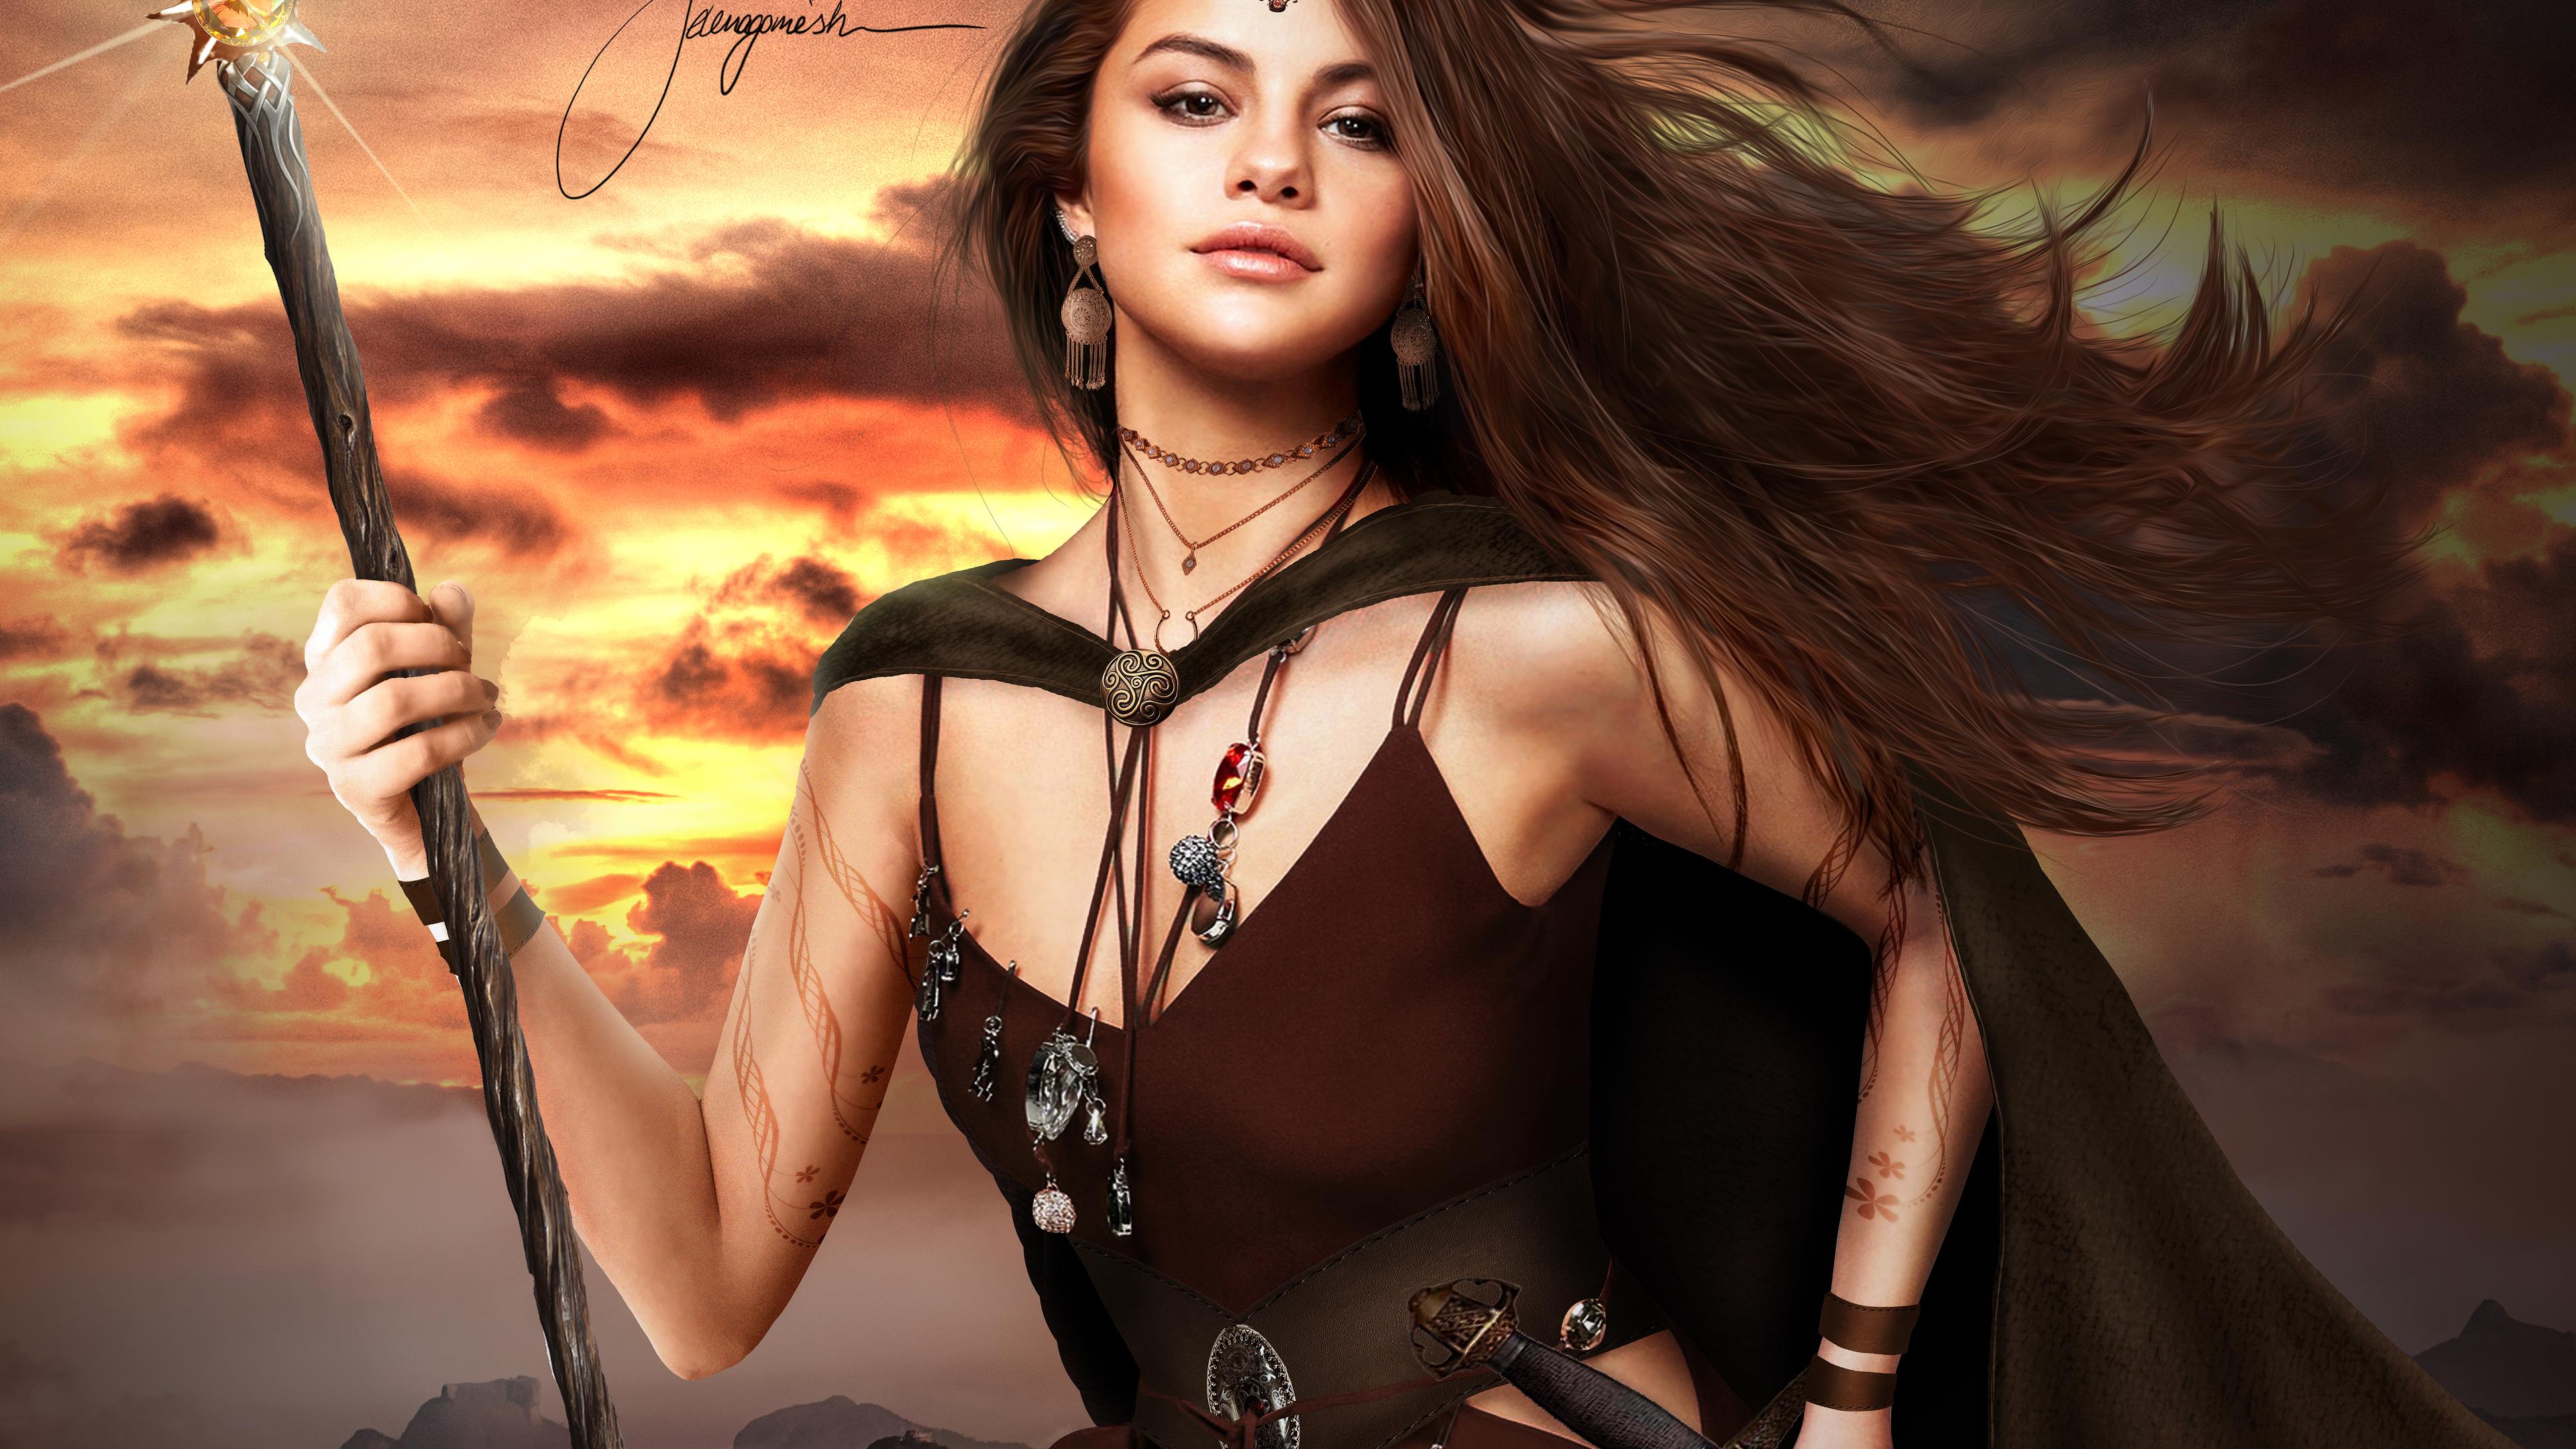 selena gomez warrior 1536863107 - Selena Gomez Warrior - warrior wallpapers, selena gomez wallpapers, music wallpapers, hd-wallpapers, girls wallpapers, deviantart wallpapers, celebrities wallpapers, artist wallpapers, 5k wallpapers, 4k-wallpapers